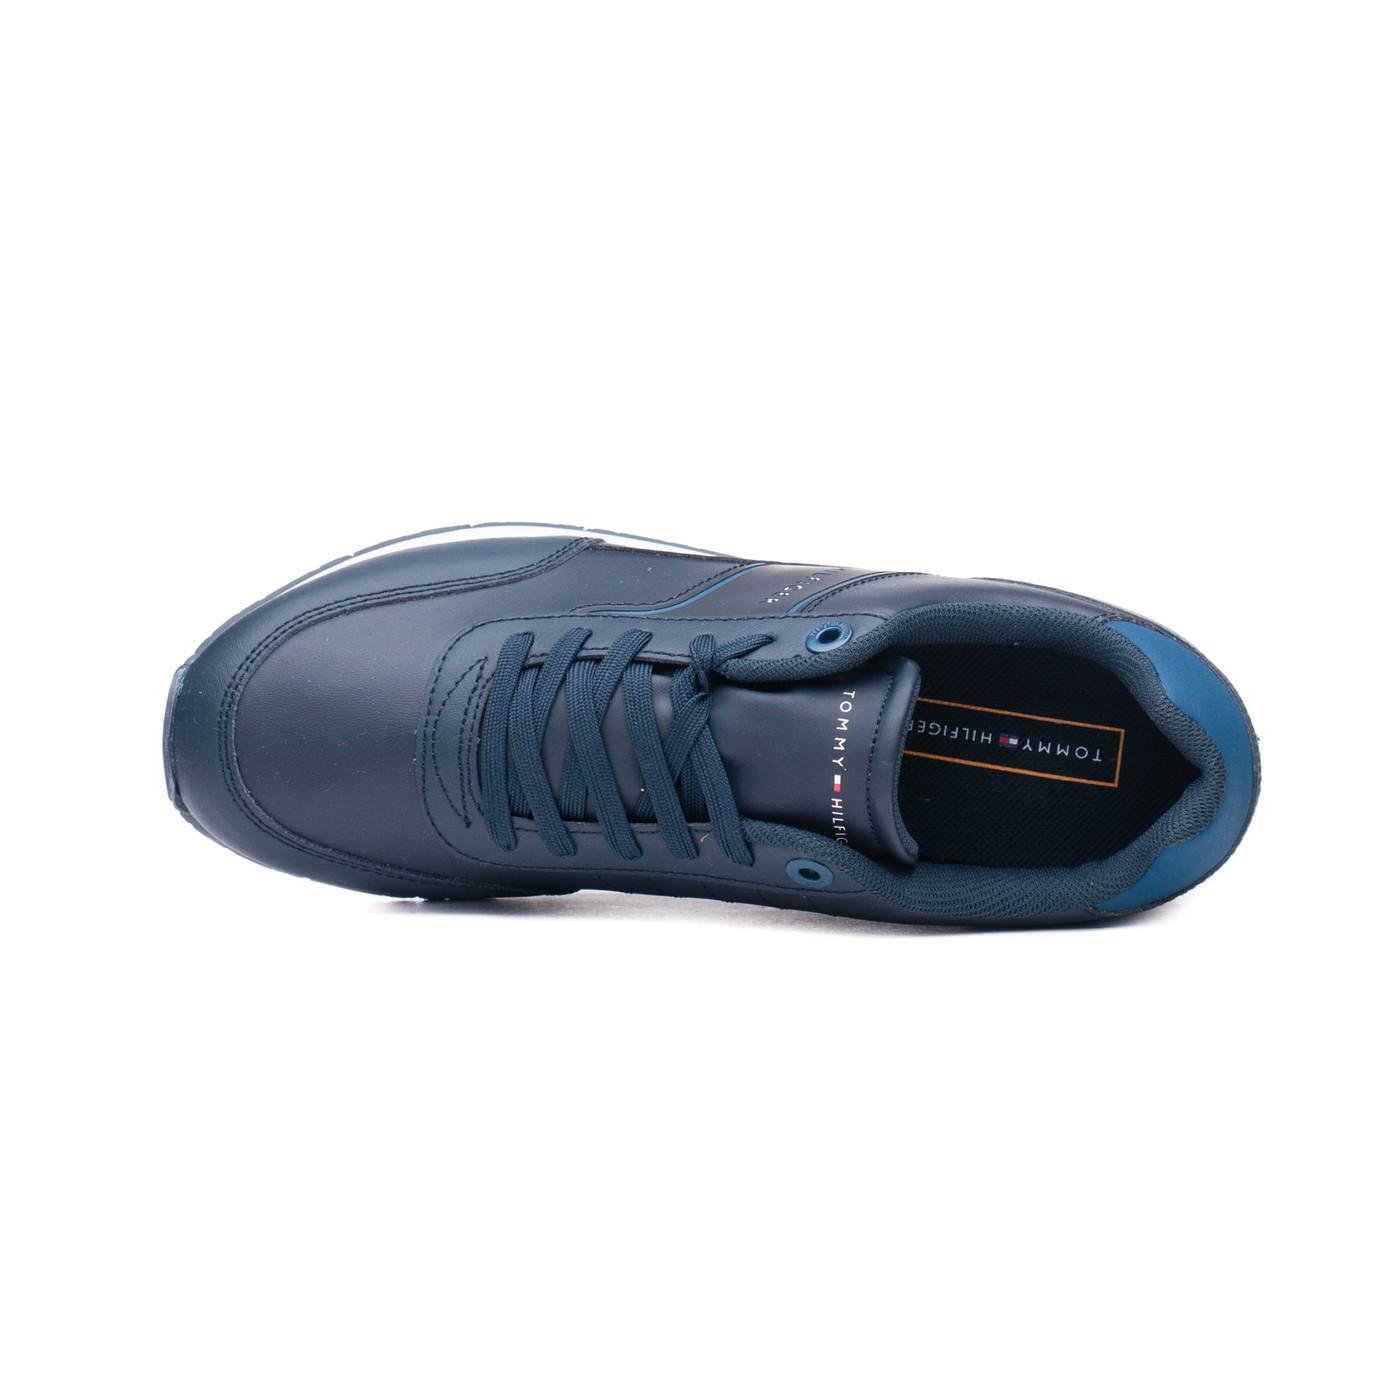 Кросівки чоловічі Tommy Hilfiger CORPORATE LEATHER RUNNER